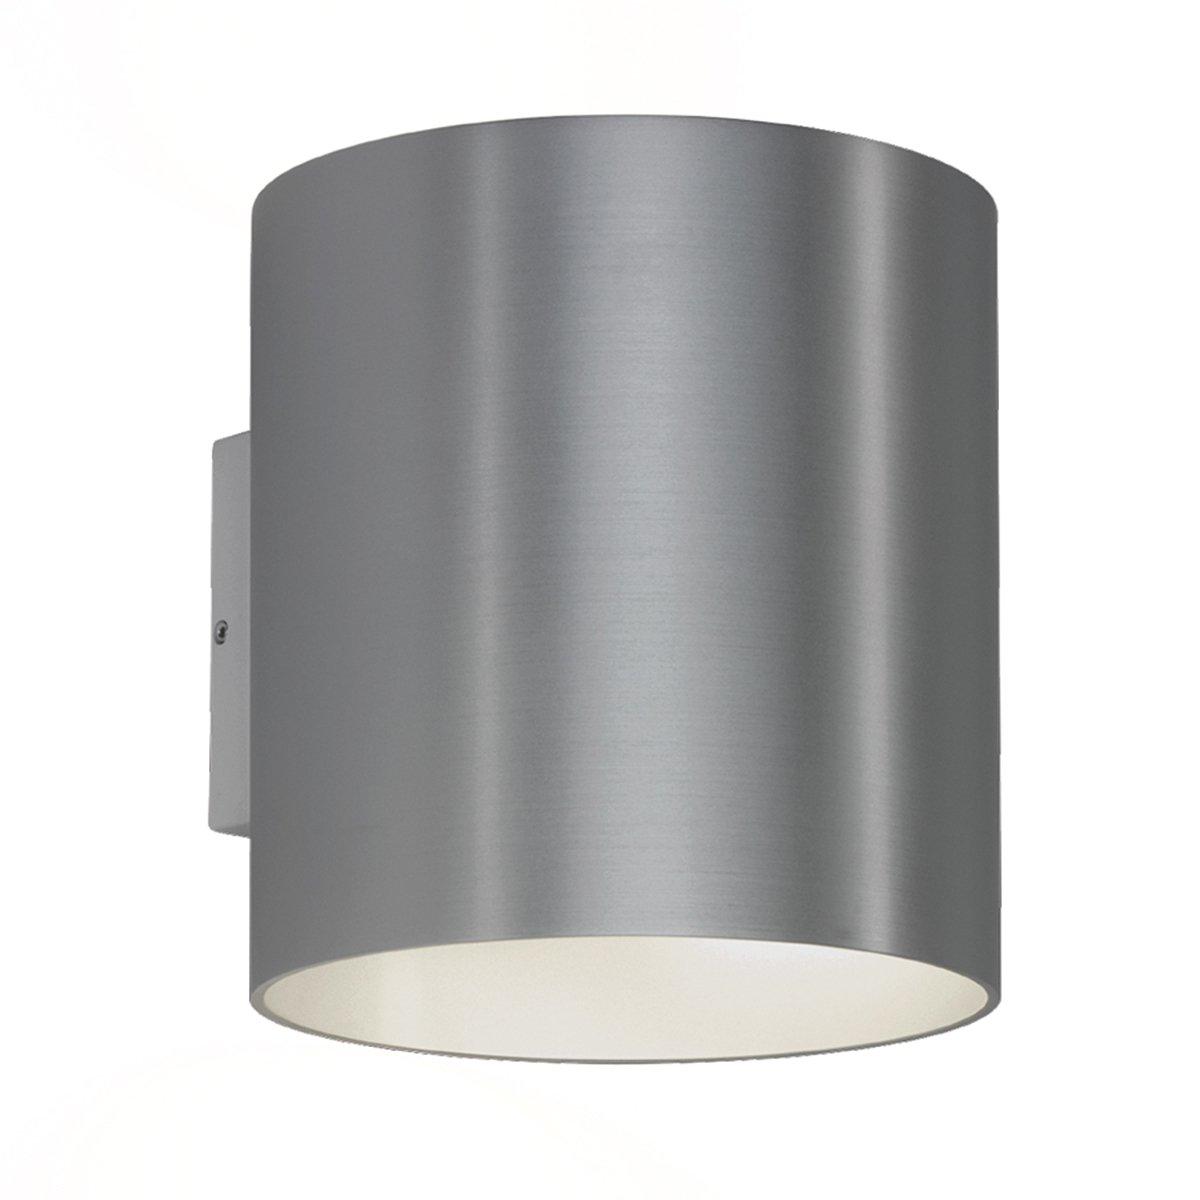 Wever & Ducr� Ray 3.0 Outdoor Wandlamp Grijs - 2700 Kelvin